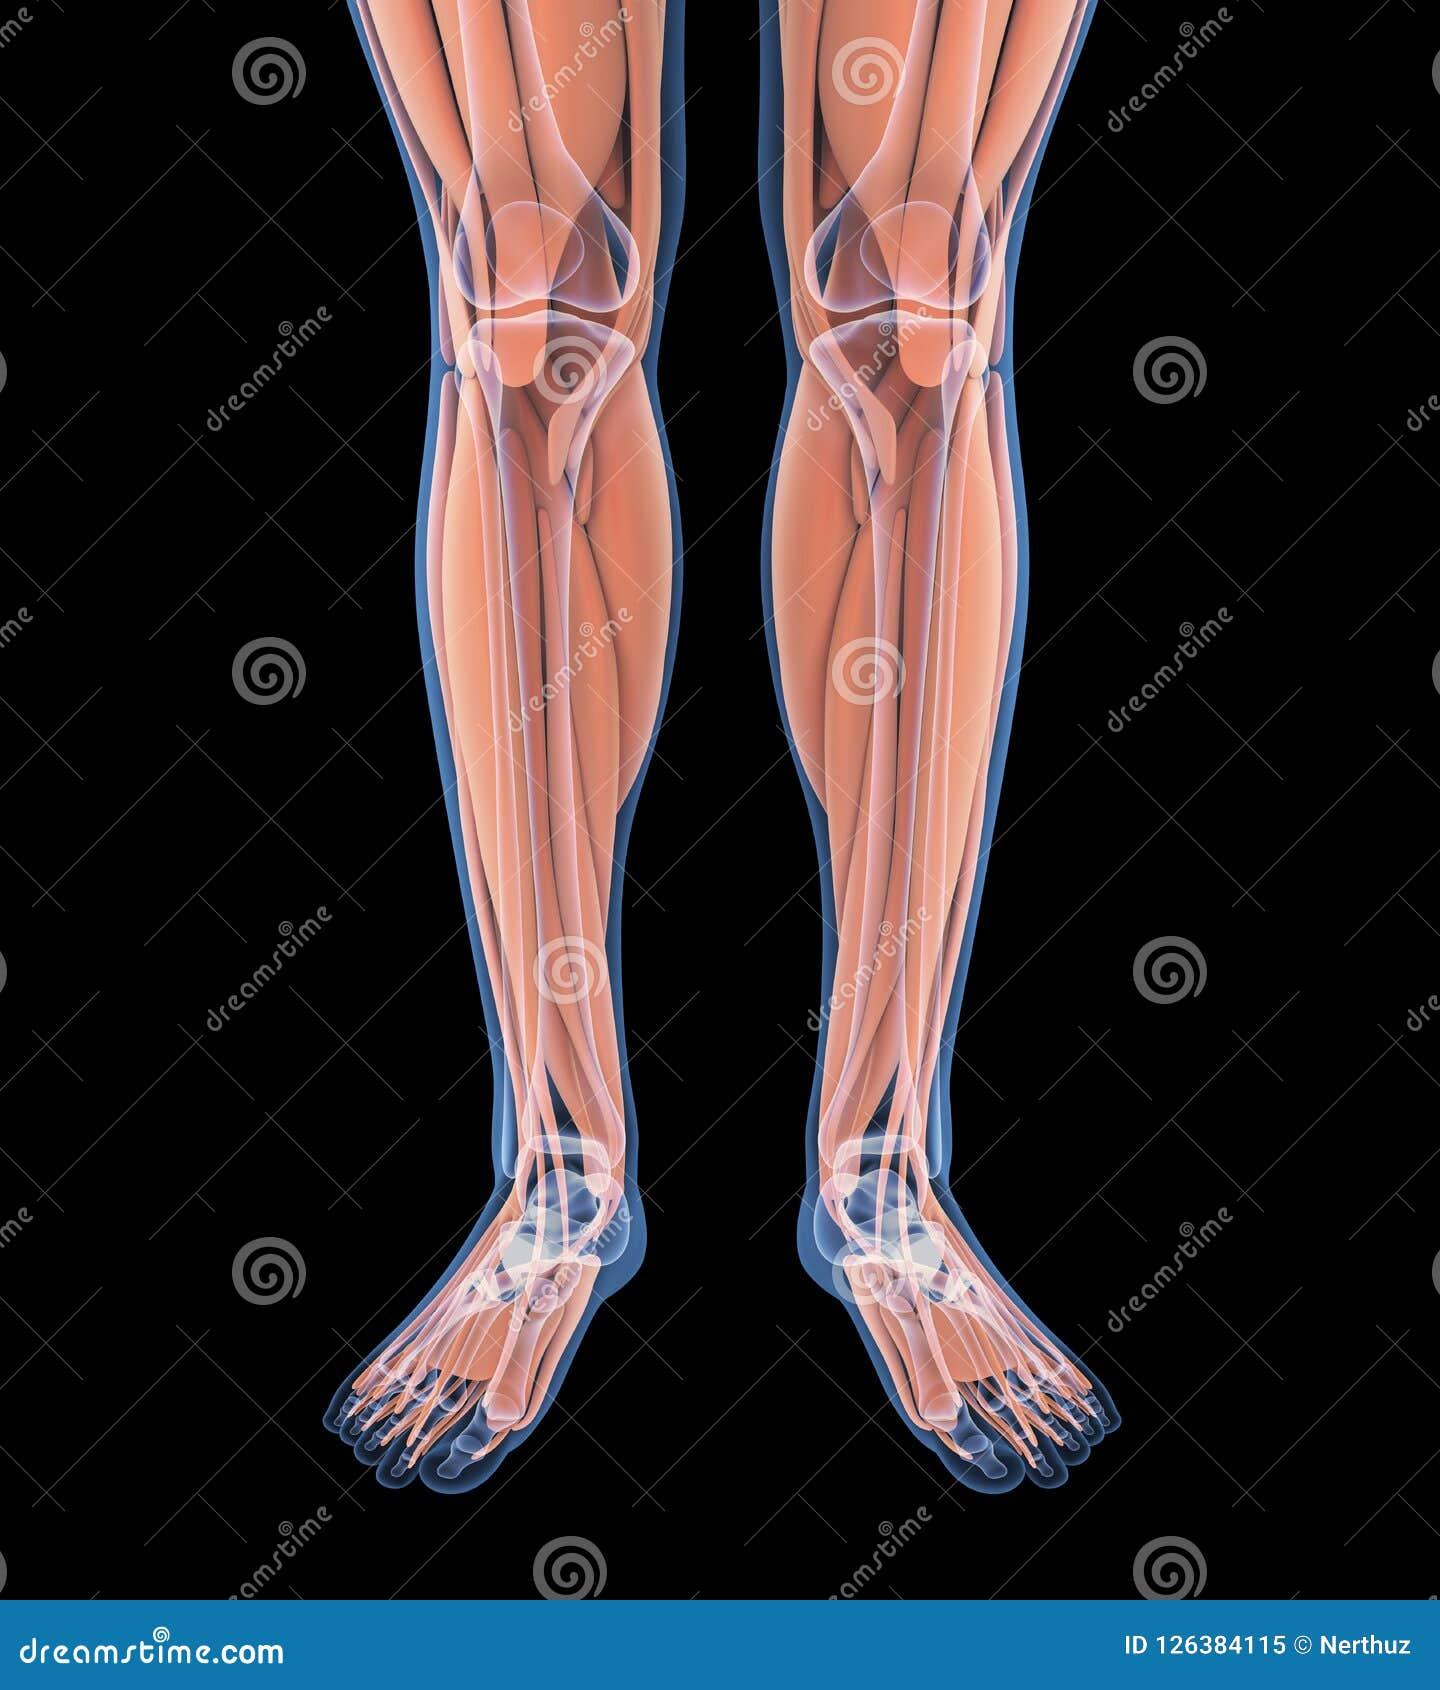 Human Leg Muscles Anatomy Stock Illustration Illustration Of Bone